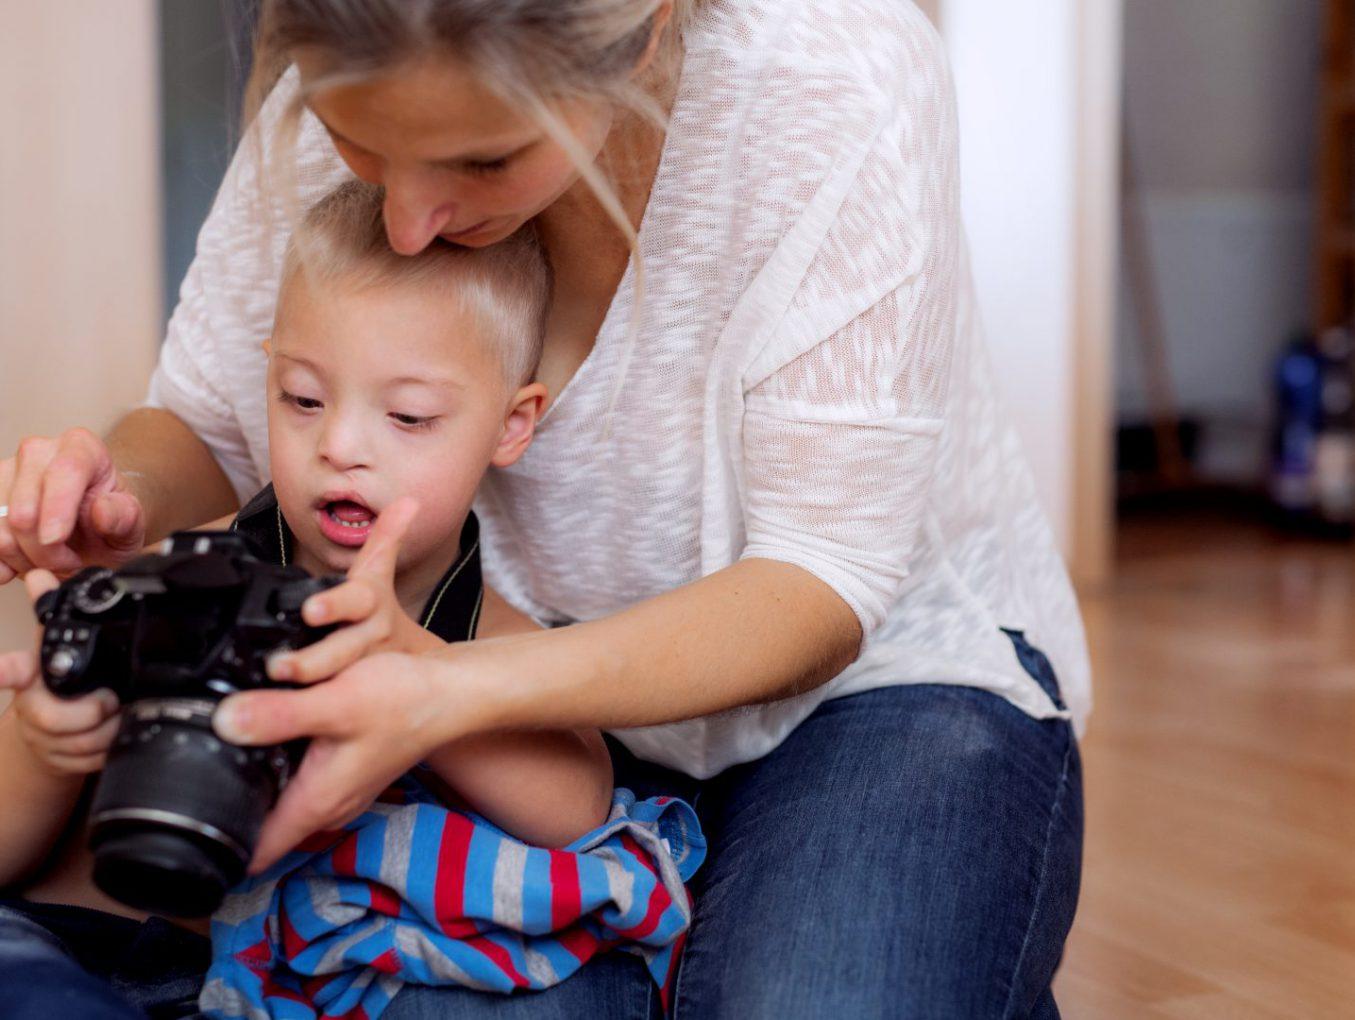 Parenting Plans for Special Needs Children: Part 2